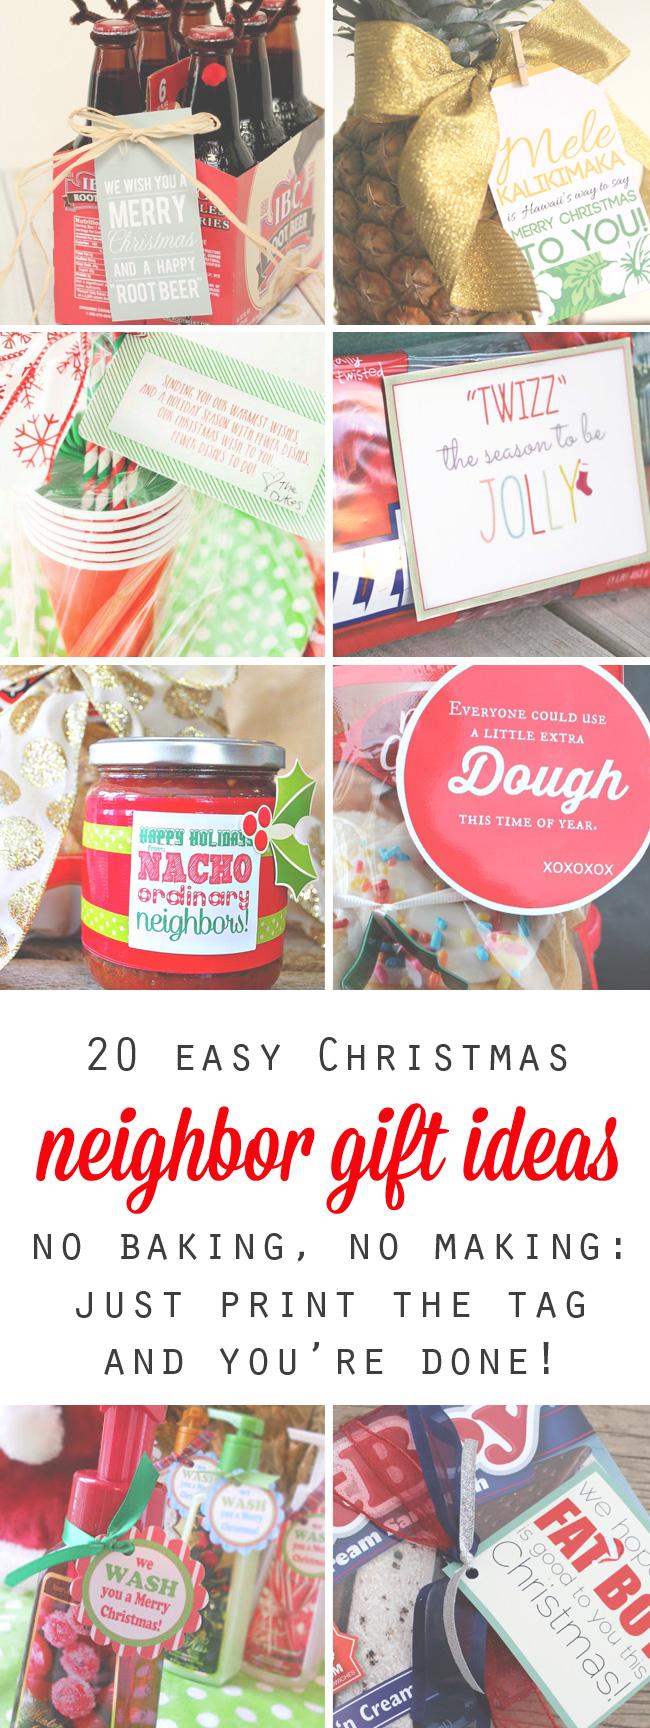 Collage of easy Christmas neighbor gift ideas